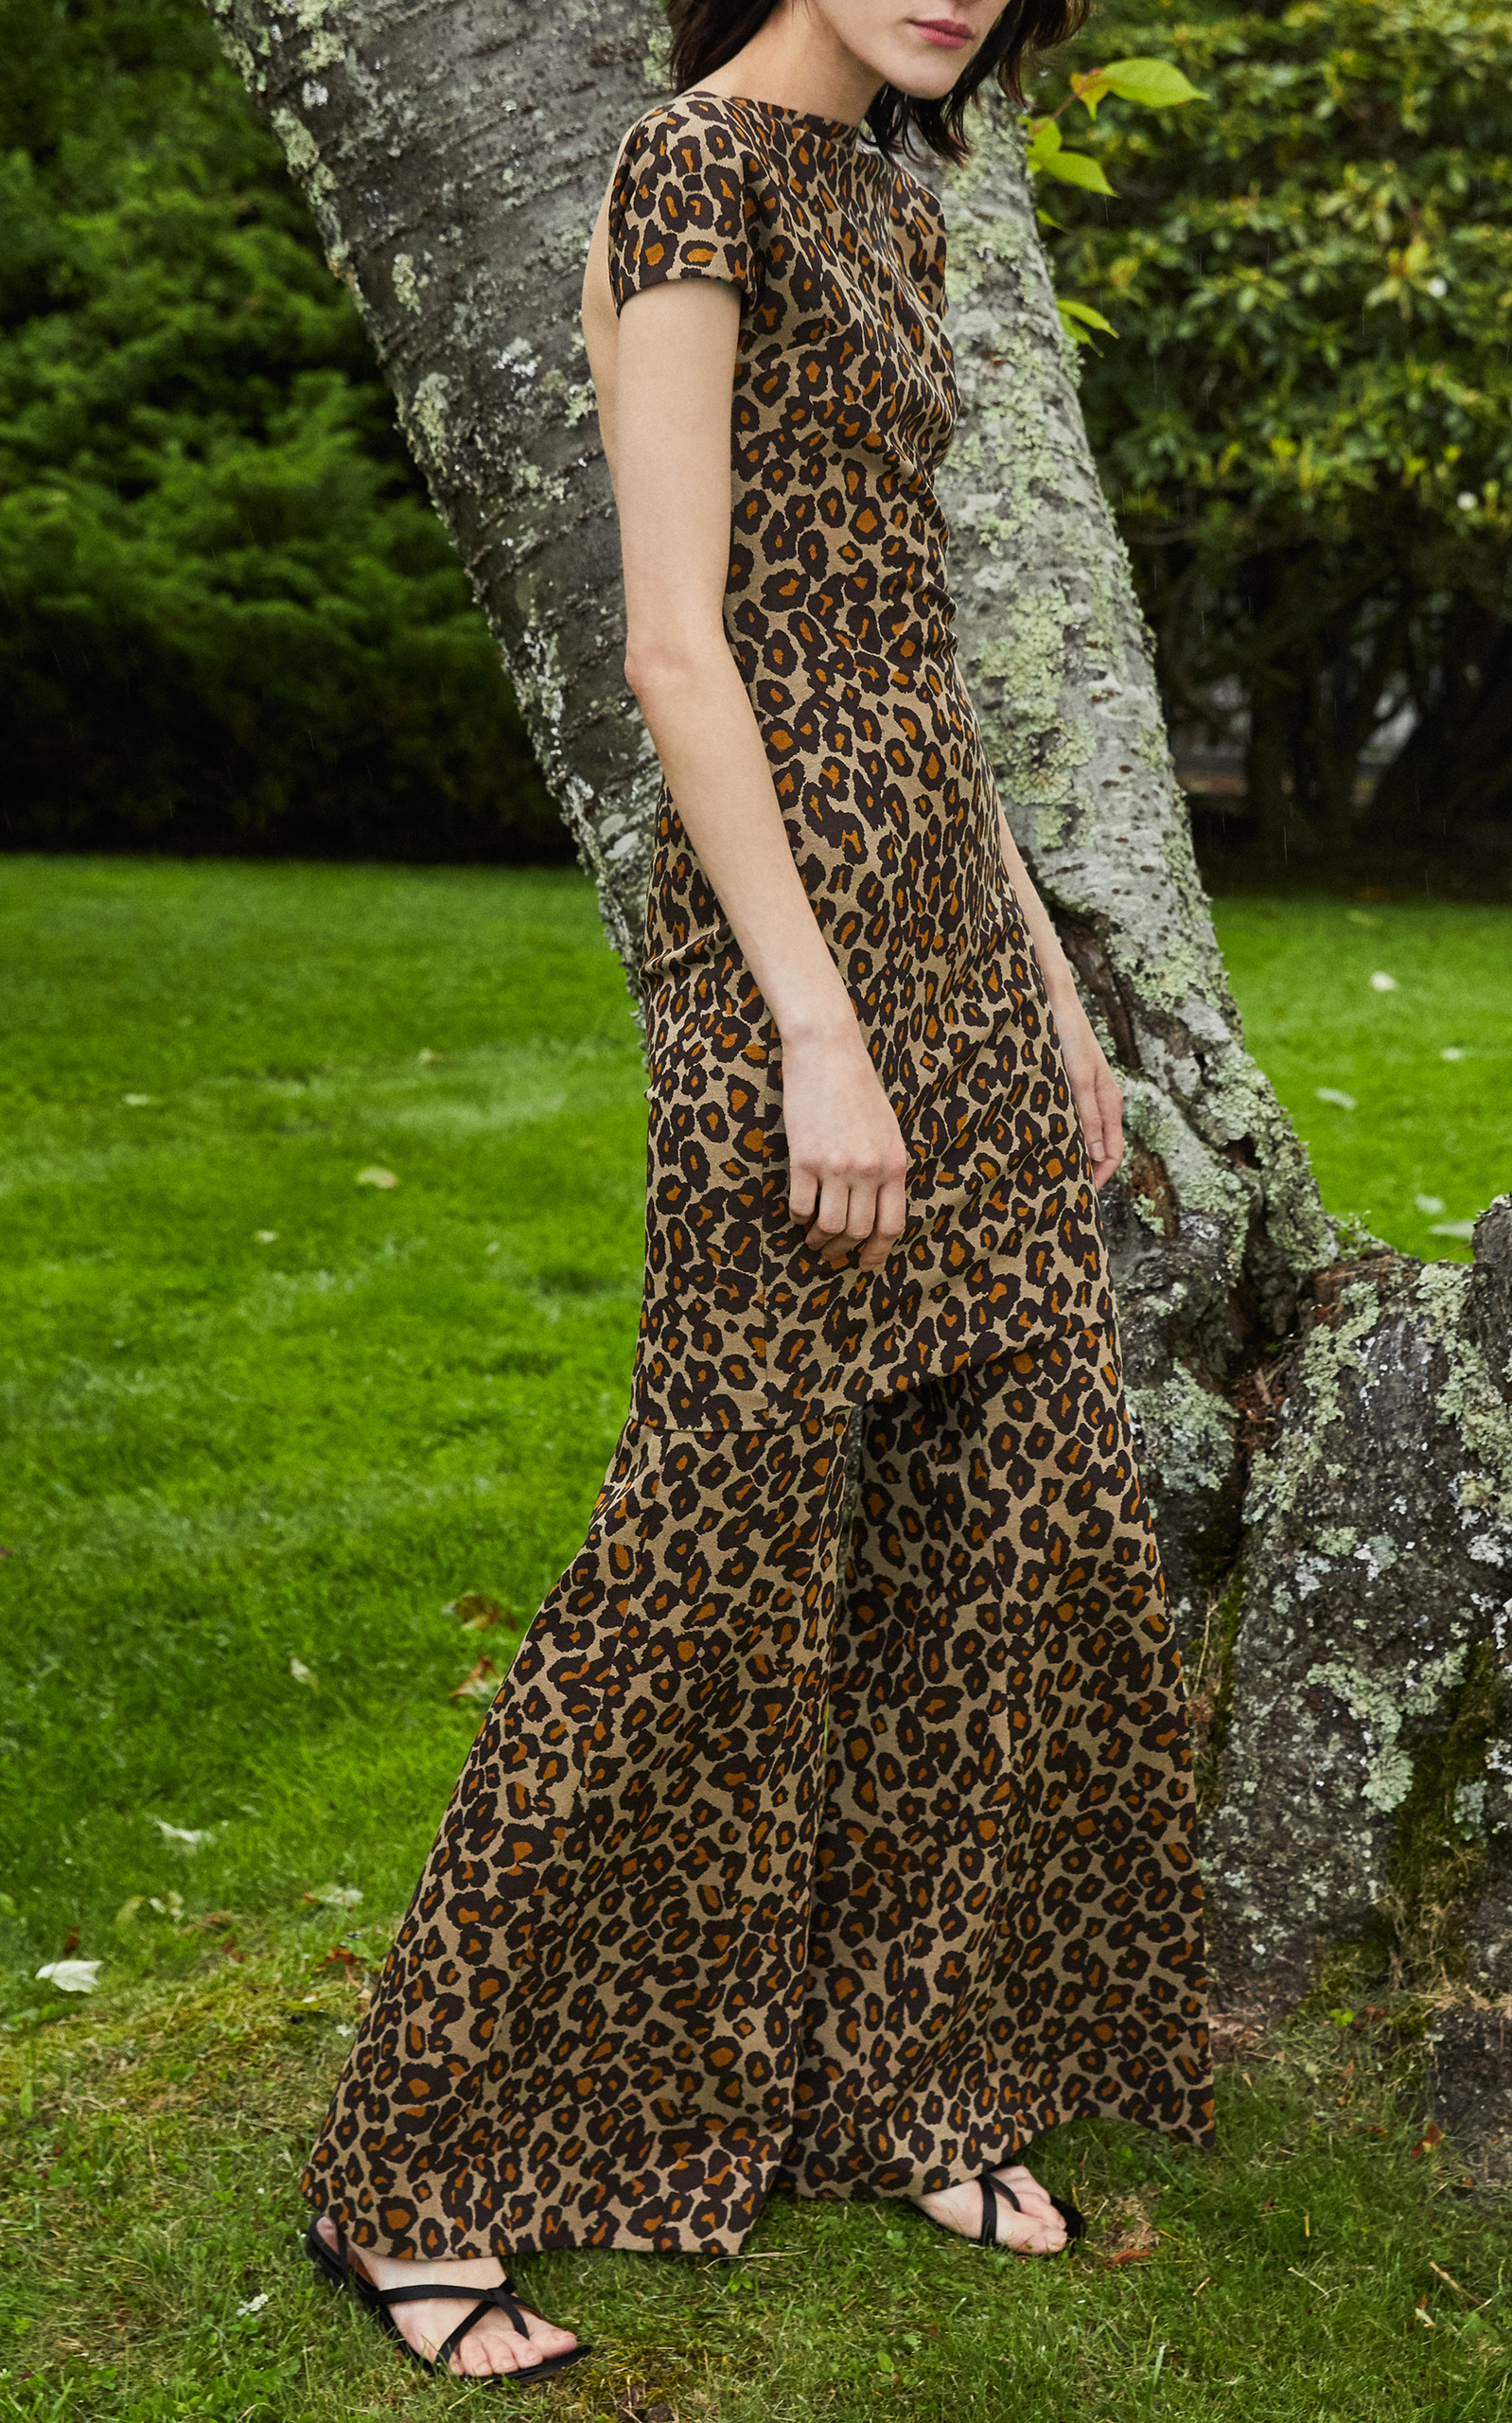 Backless Leopard Print Mini Dress by Rosetta Getty  9e7f71c75